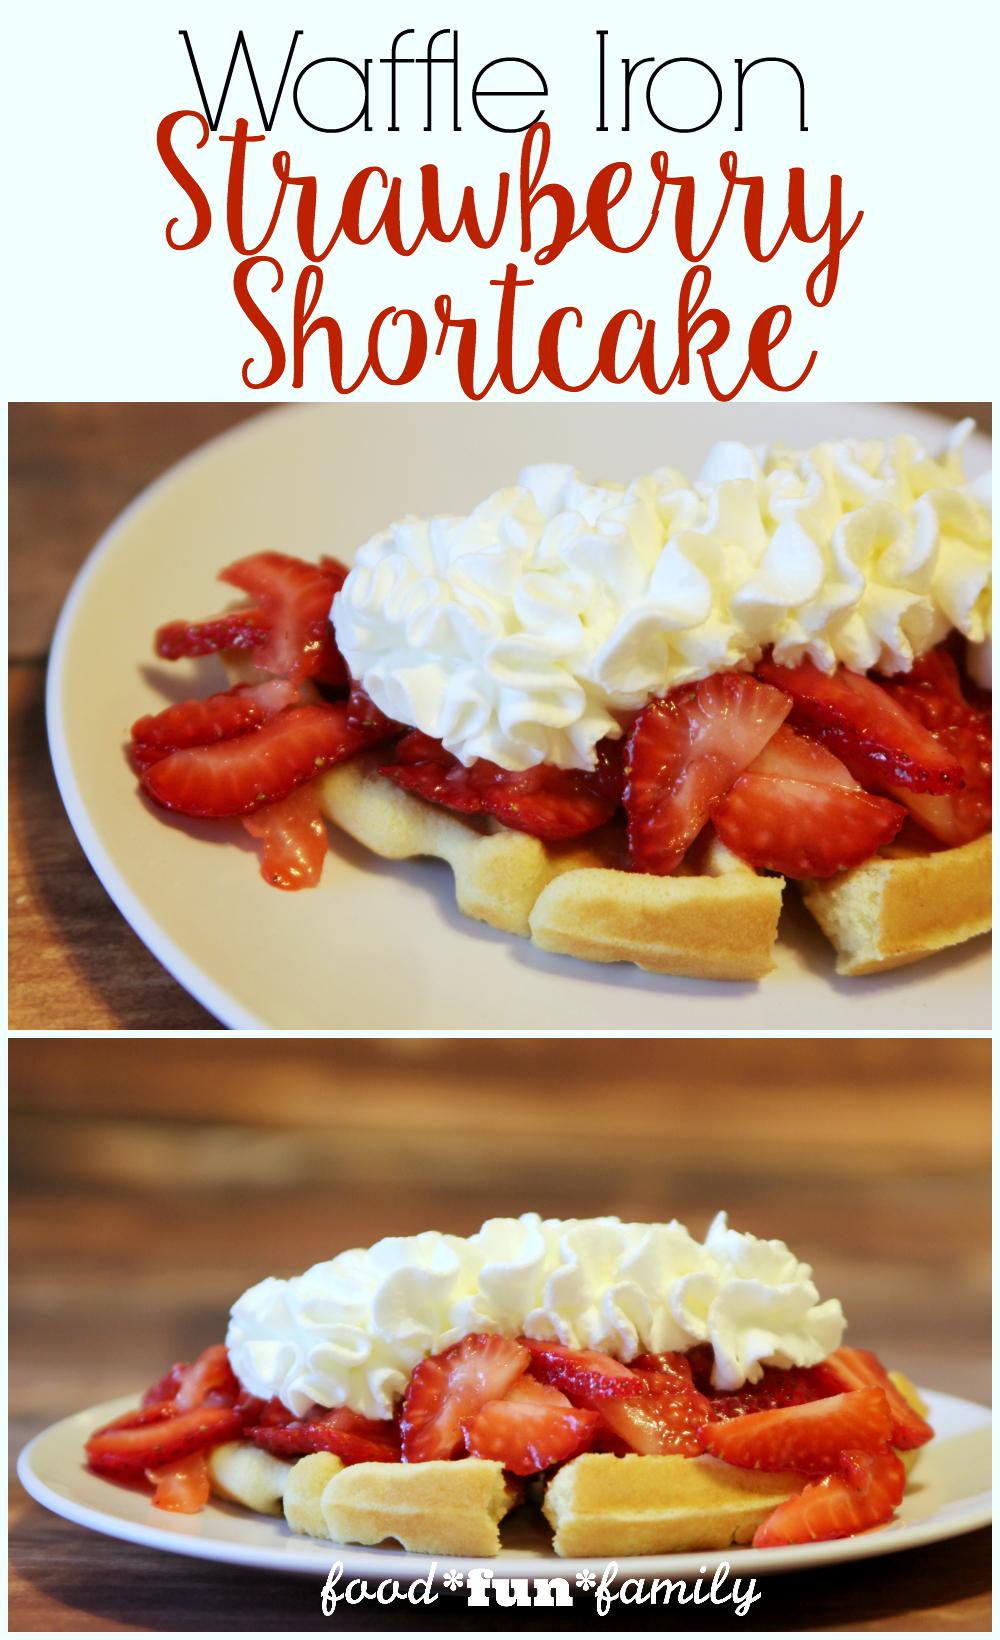 Waffle Iron Strawberry Shortcake Recipe from Food Fun Family